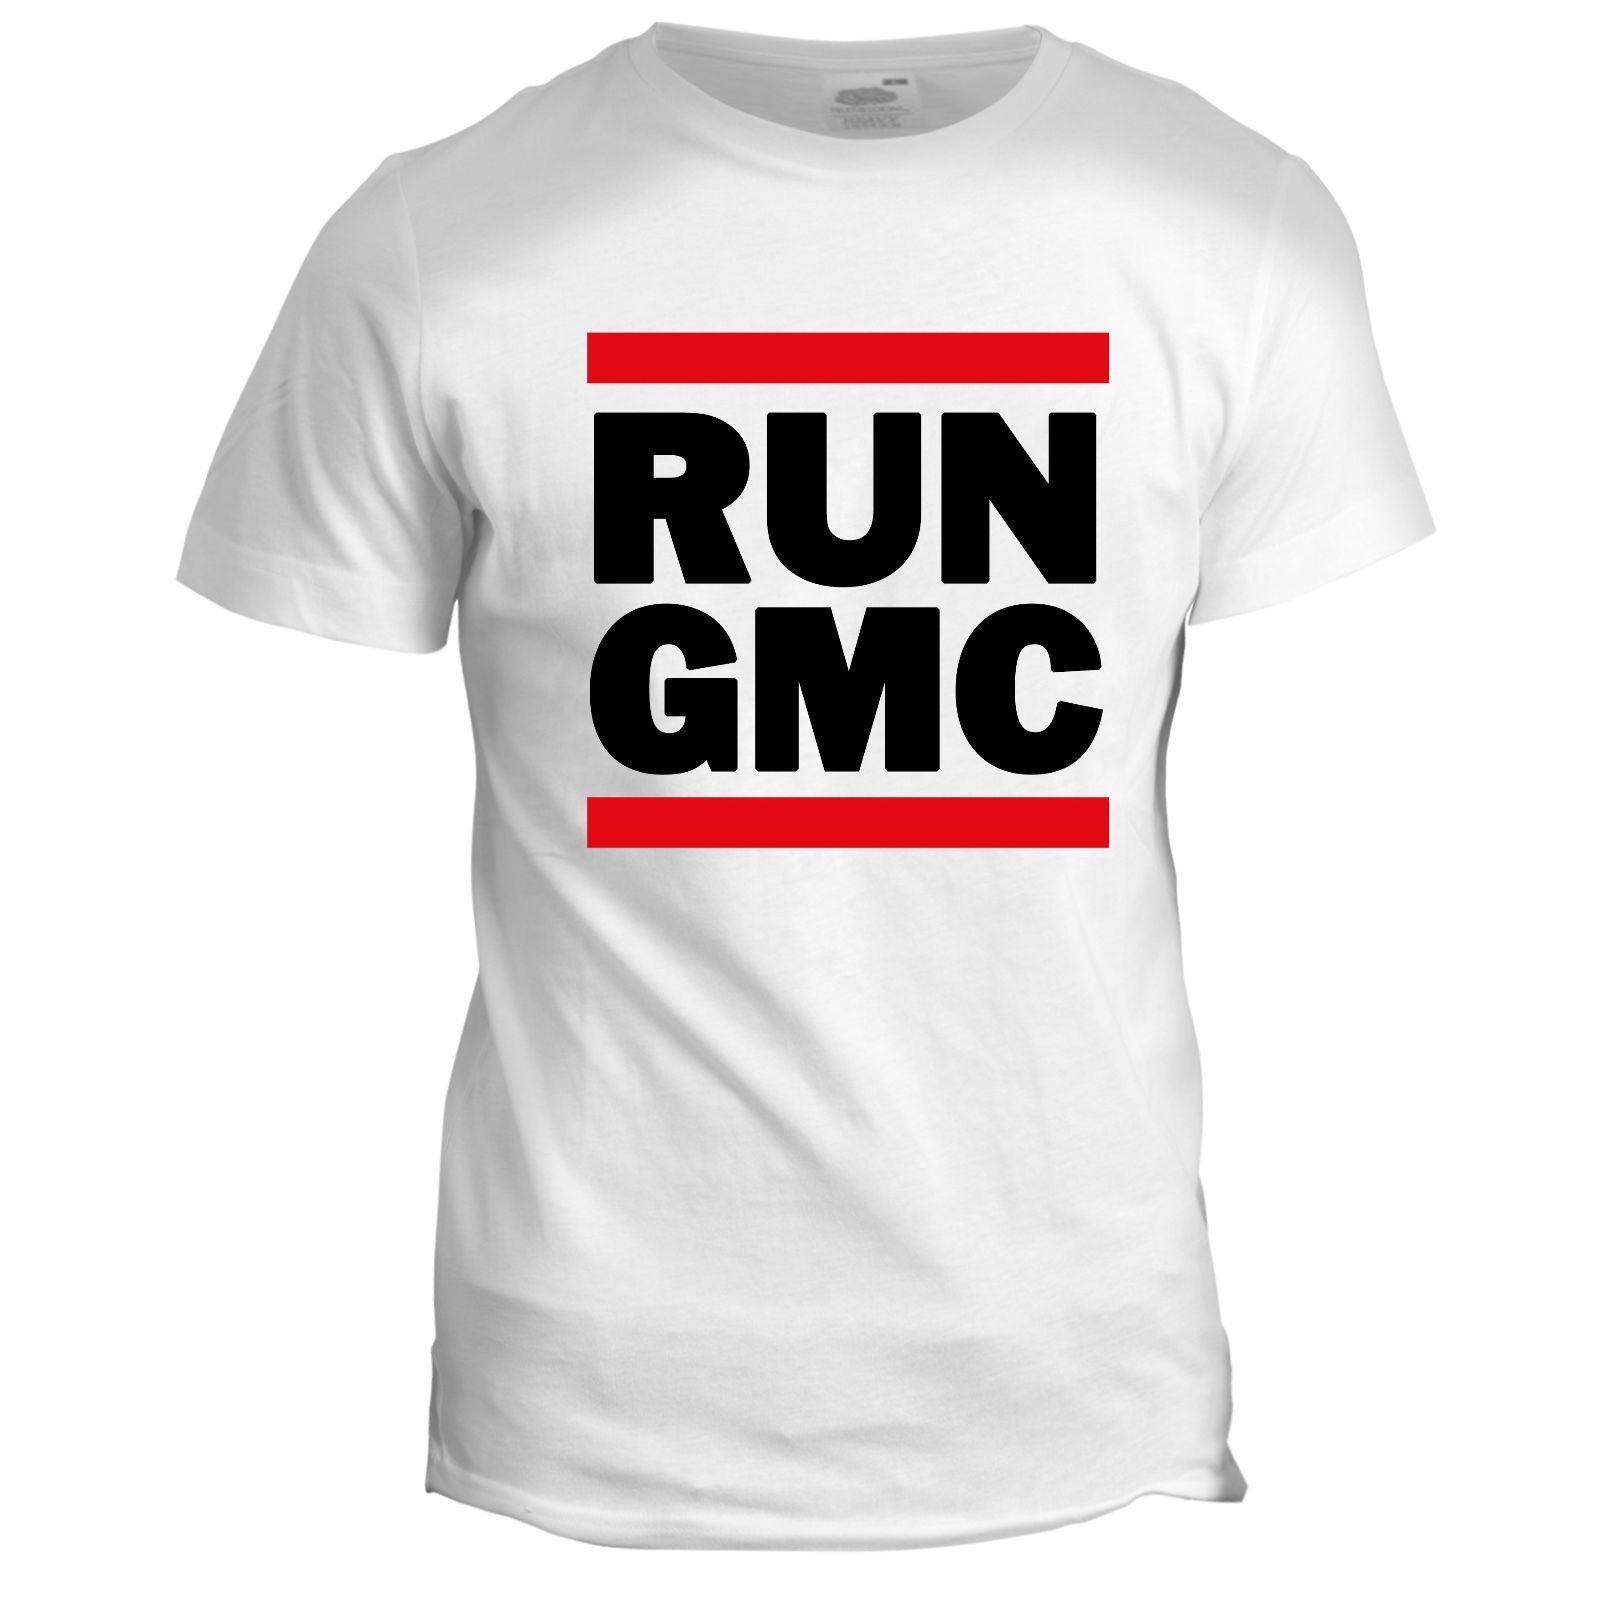 76ac7a0fd28 Run GMC Van A Team Movie Film Racing Tumblr Sports Classic T Shirt 100%  Cotton Short Sleeve O Neck T Shirt Men T Shirt O Neck Popular T Shirt Funny  It ...